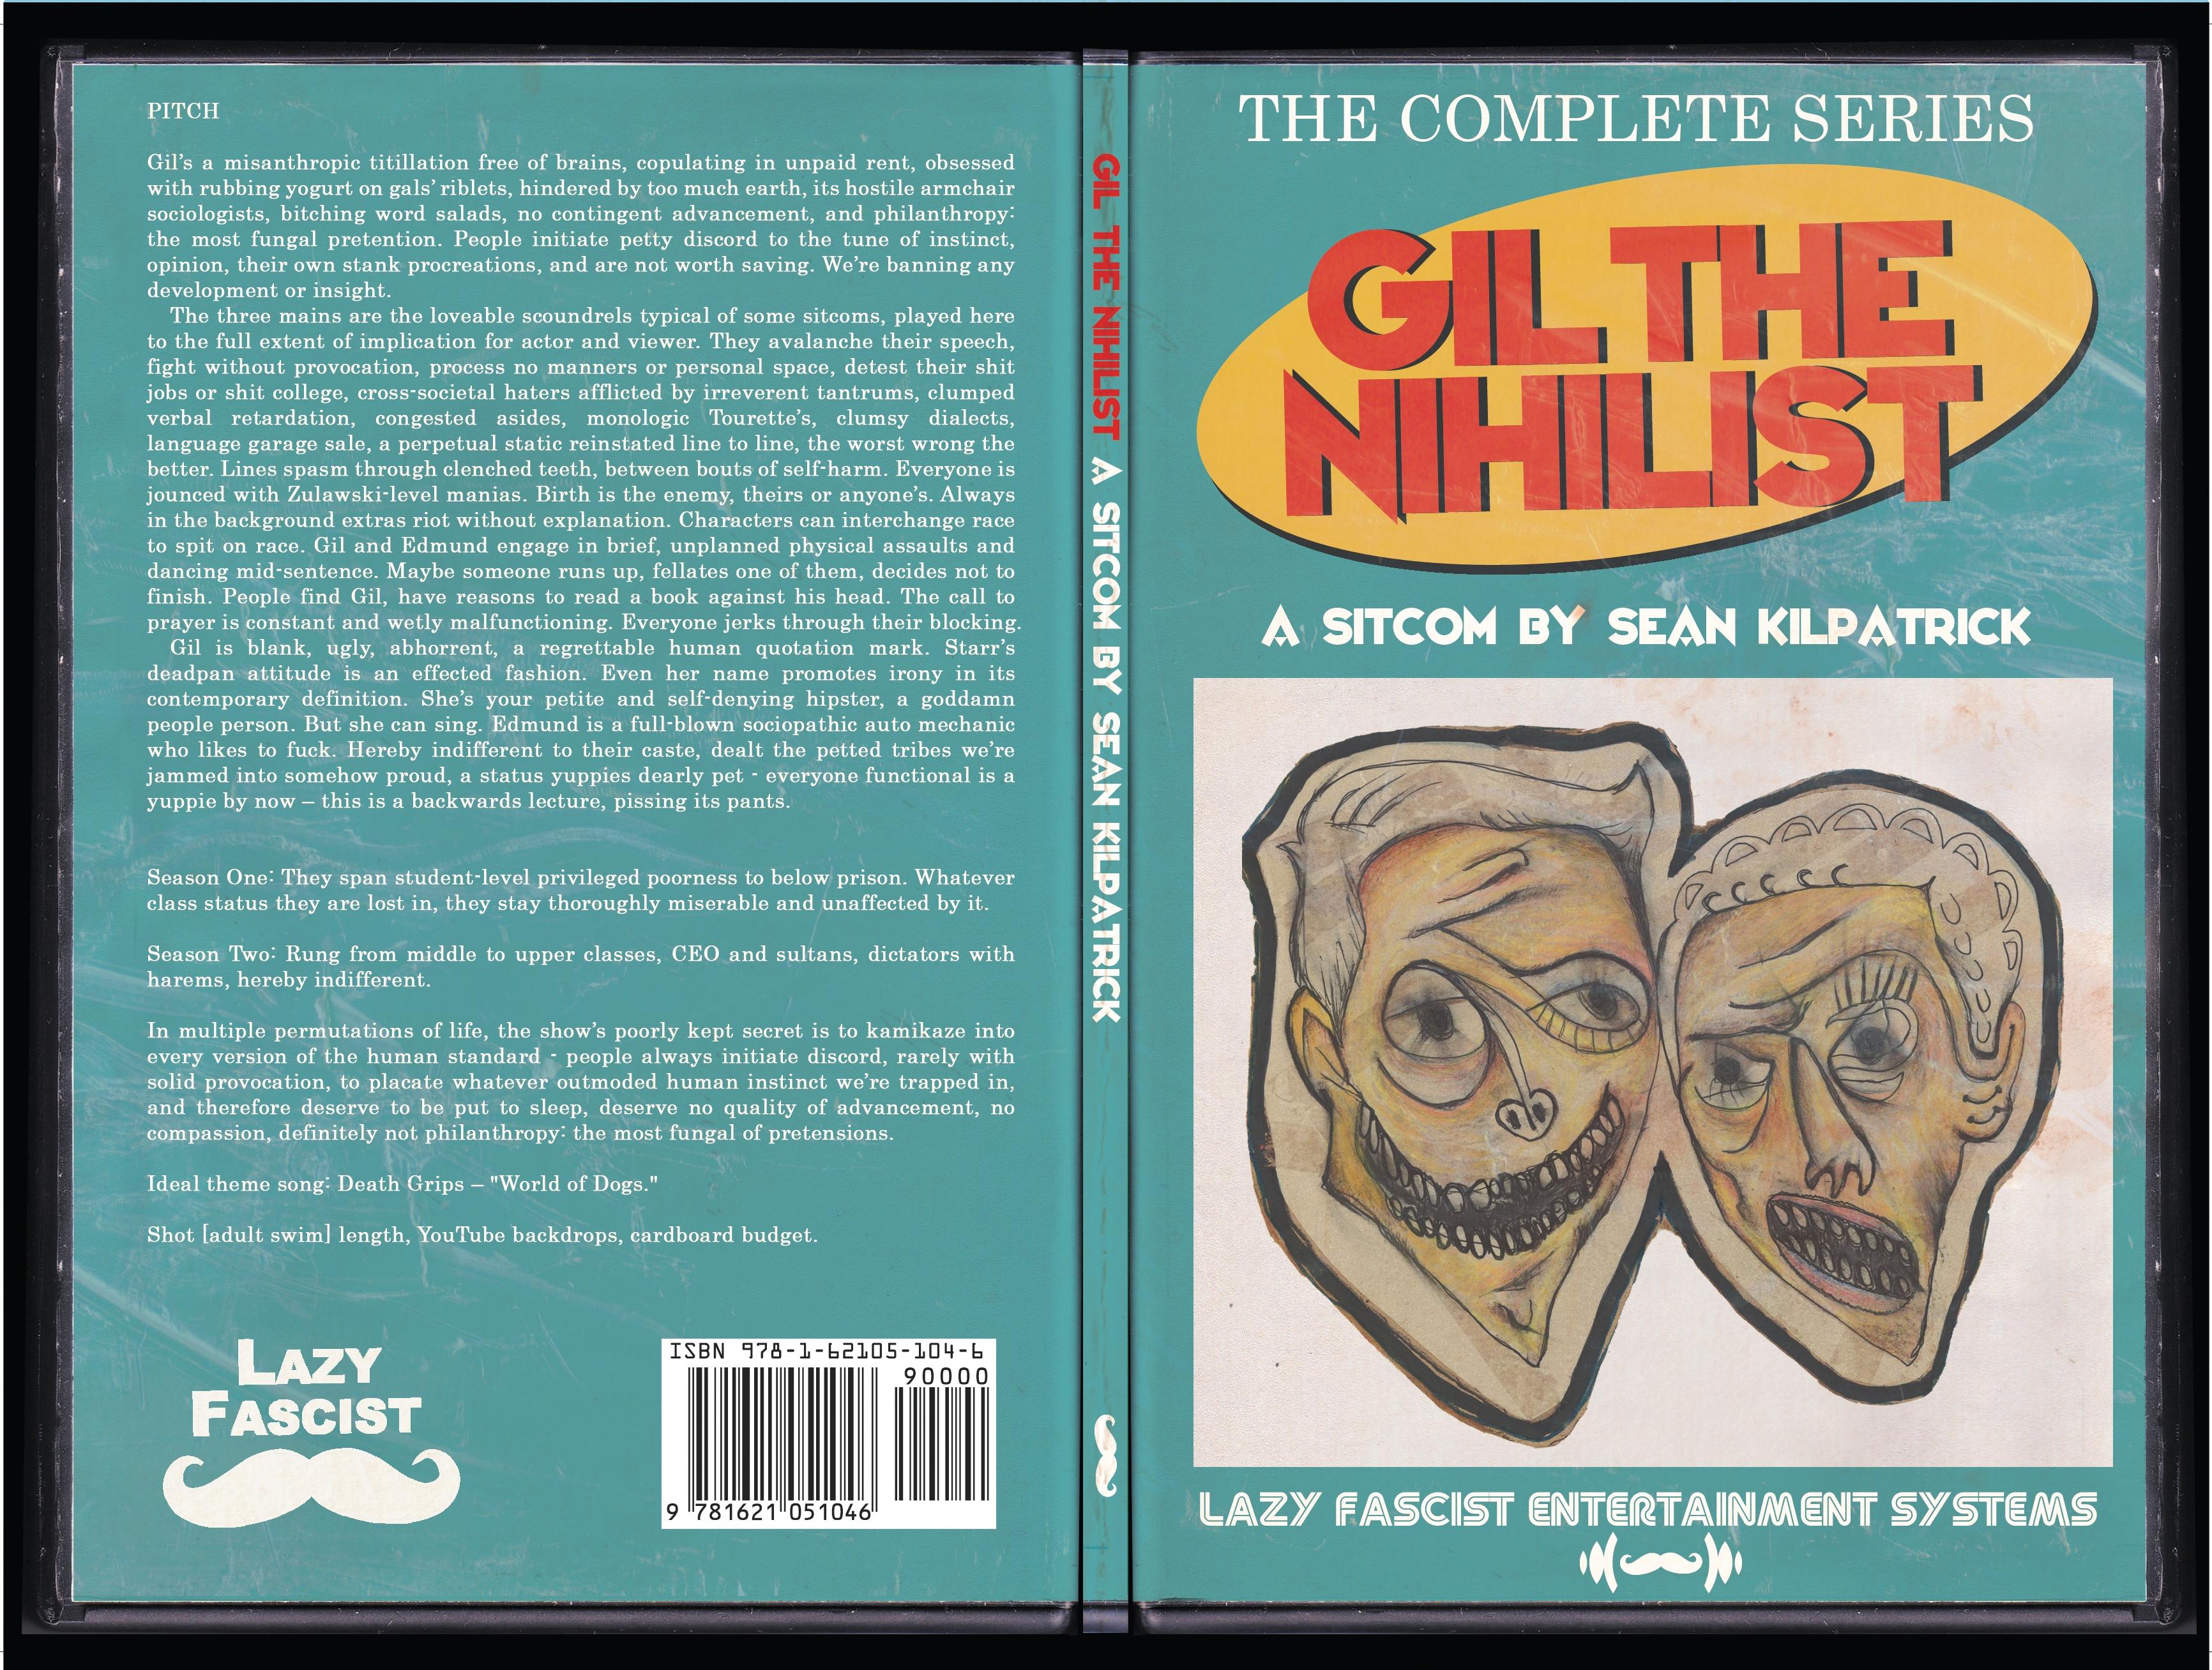 gil-the-nihilist-jacket-kill